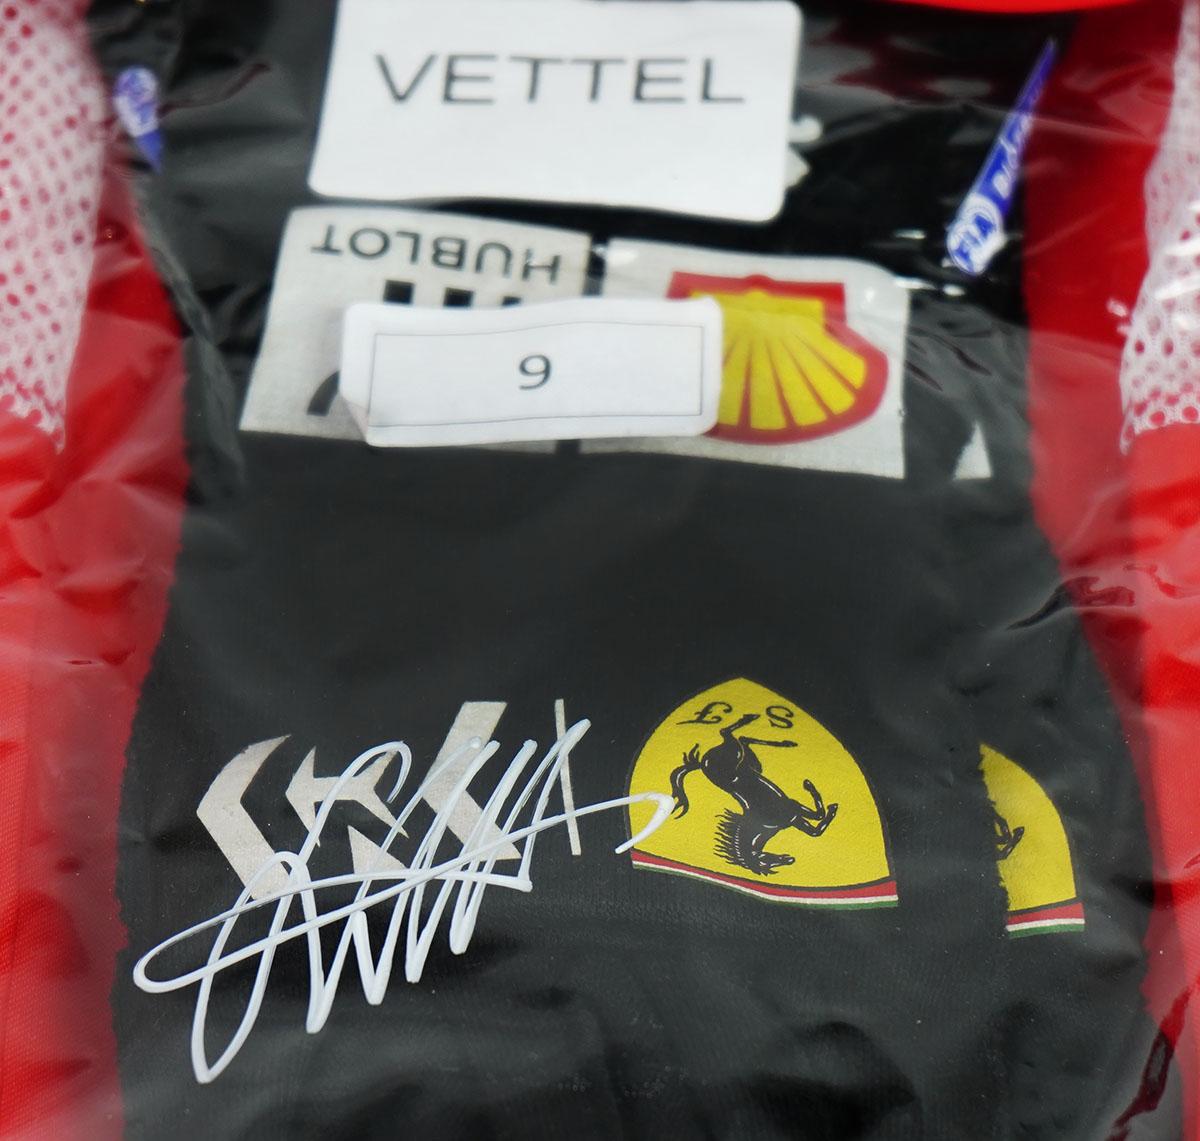 2019 Sebastian Vettel Signed Grand Prix Used Scuderia Ferrari F1 Gloves Racing Hall Of Fame Collection